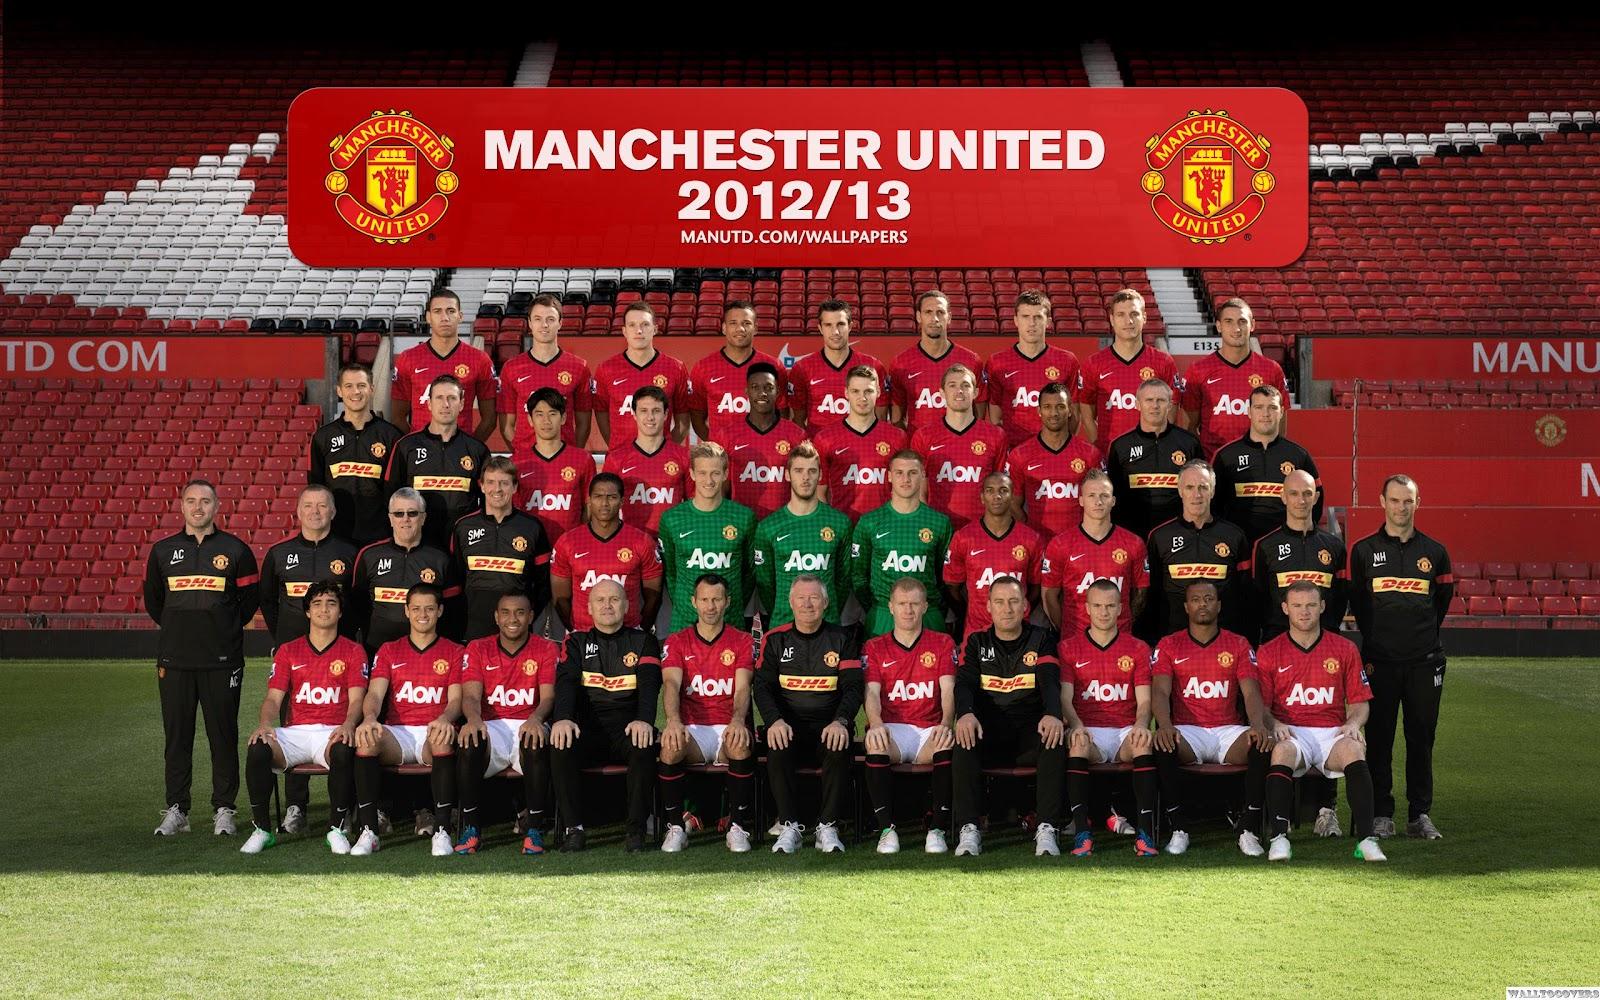 http://1.bp.blogspot.com/-sKltVwn2qn0/UGyBqk6krII/AAAAAAAABfo/S2j4tC5ui5M/s1600/manchester-united-first-squad-2012--2013..jpg